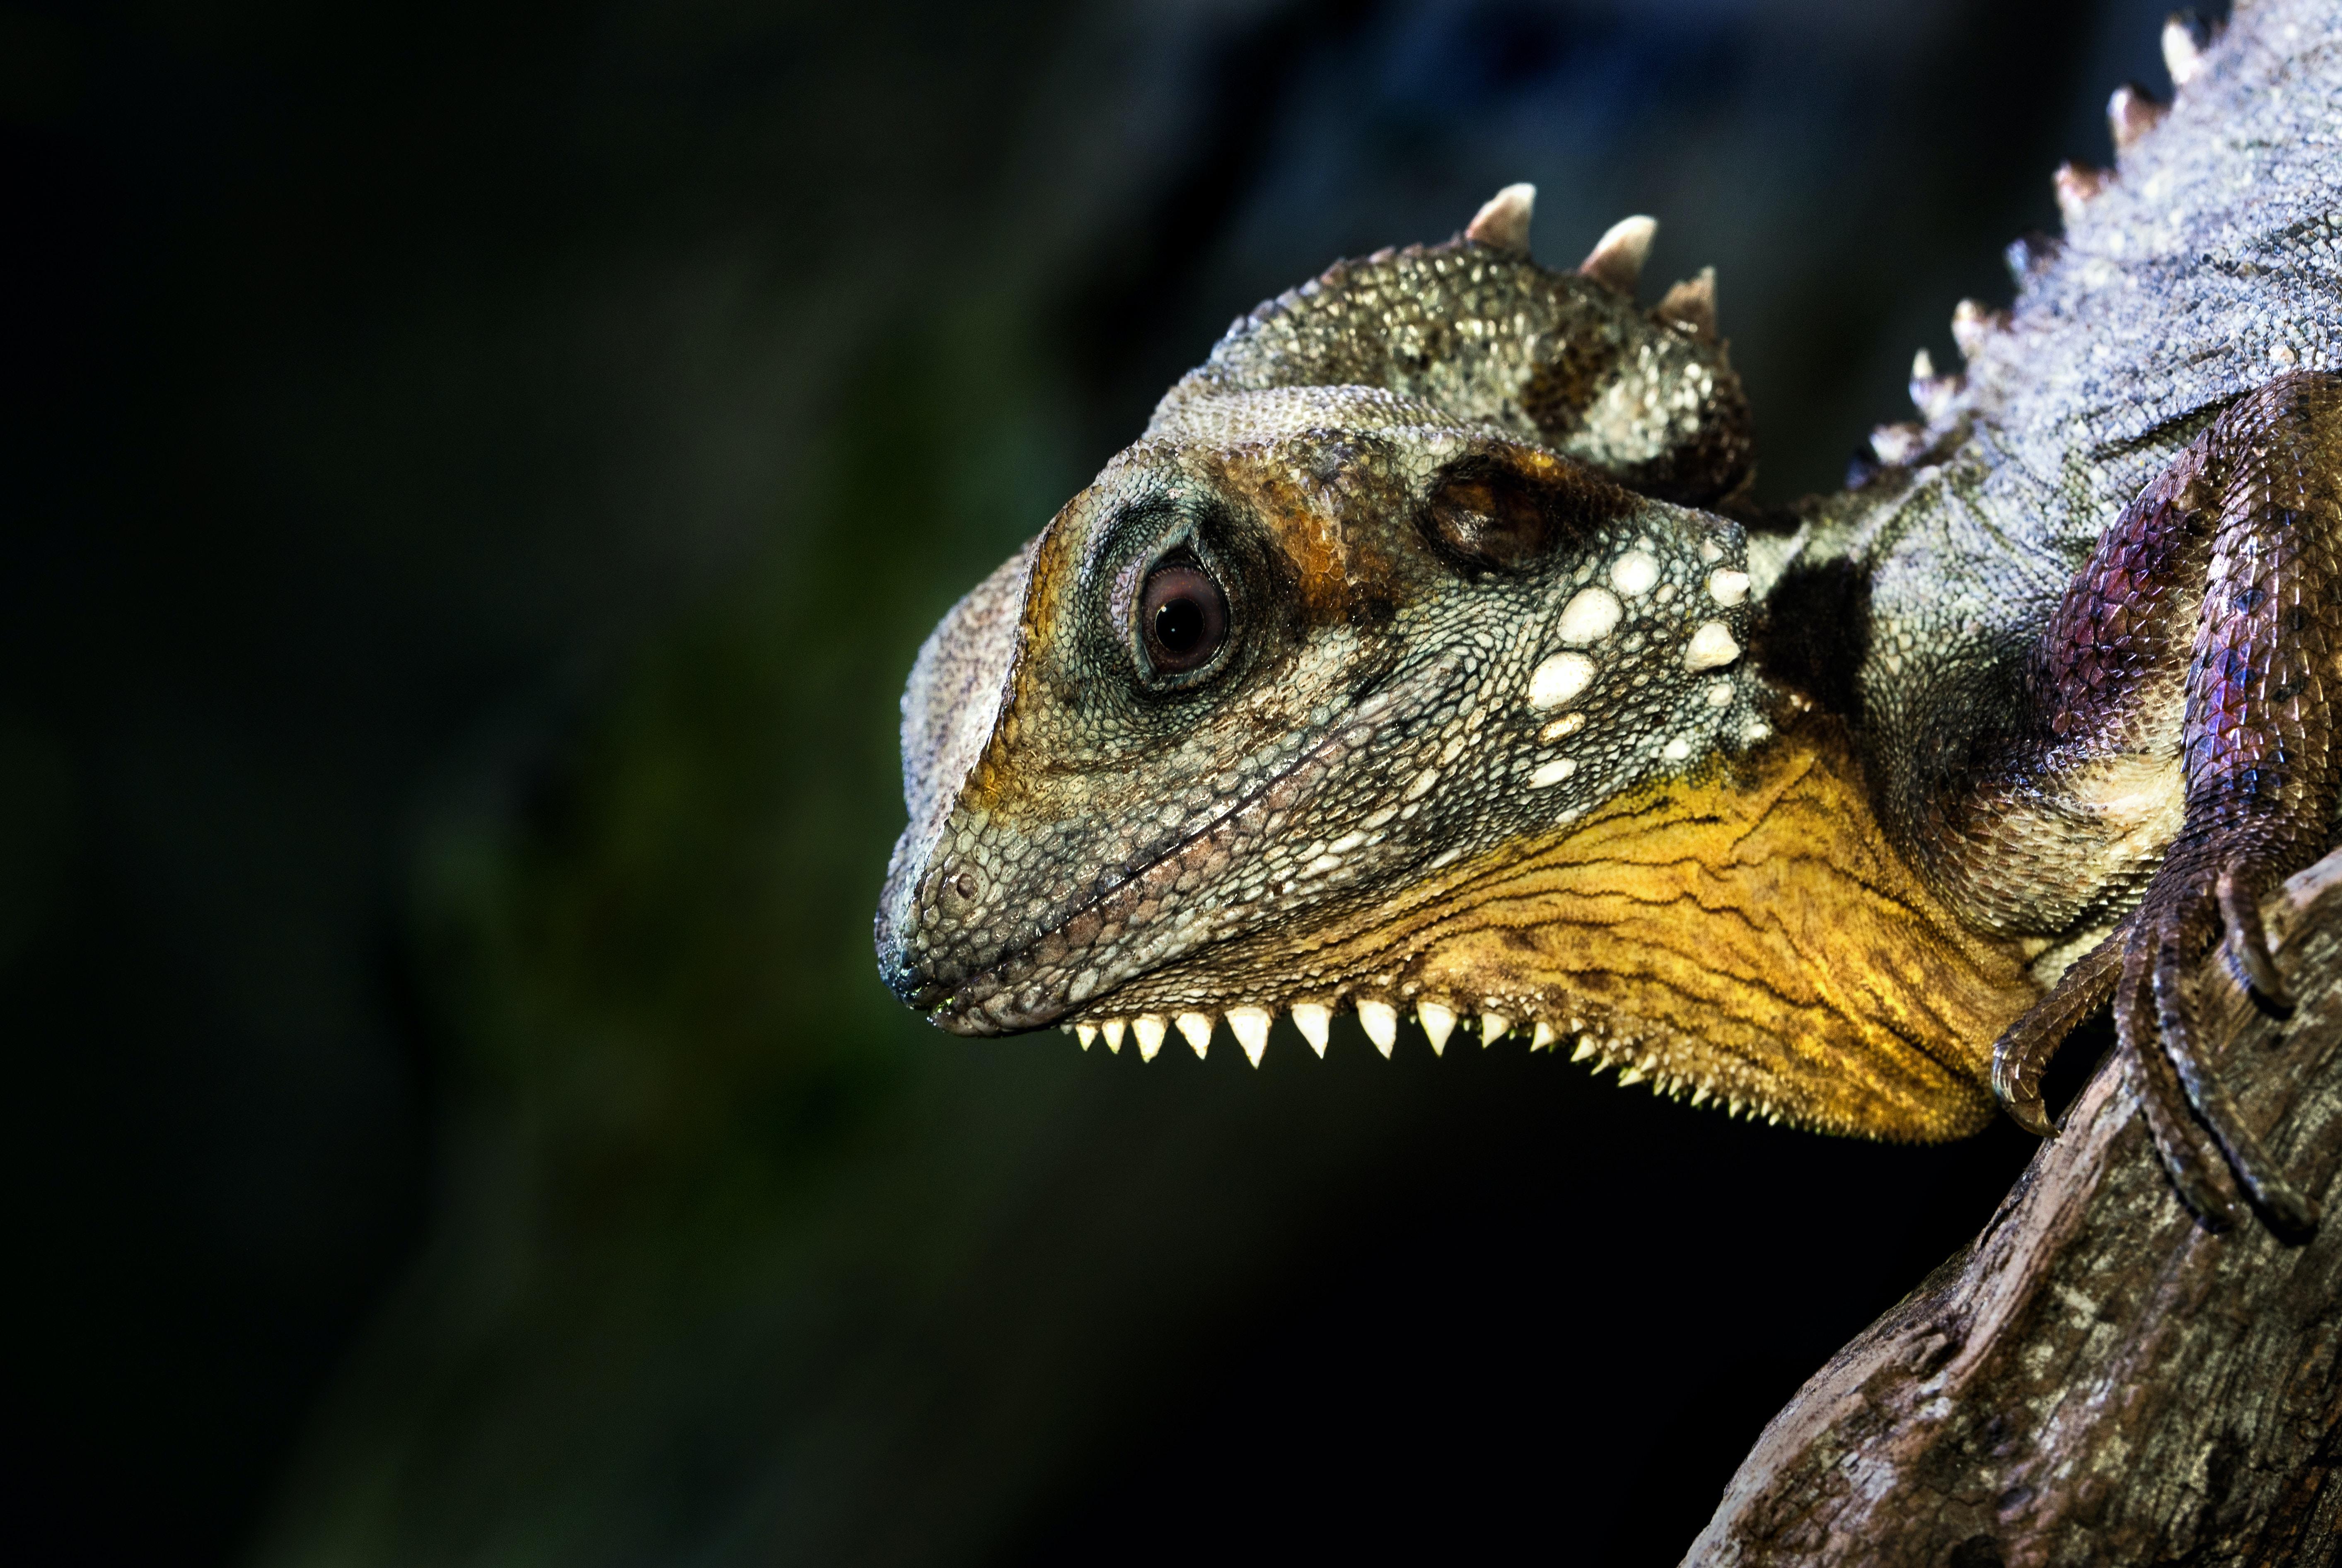 green and purple iguana on log